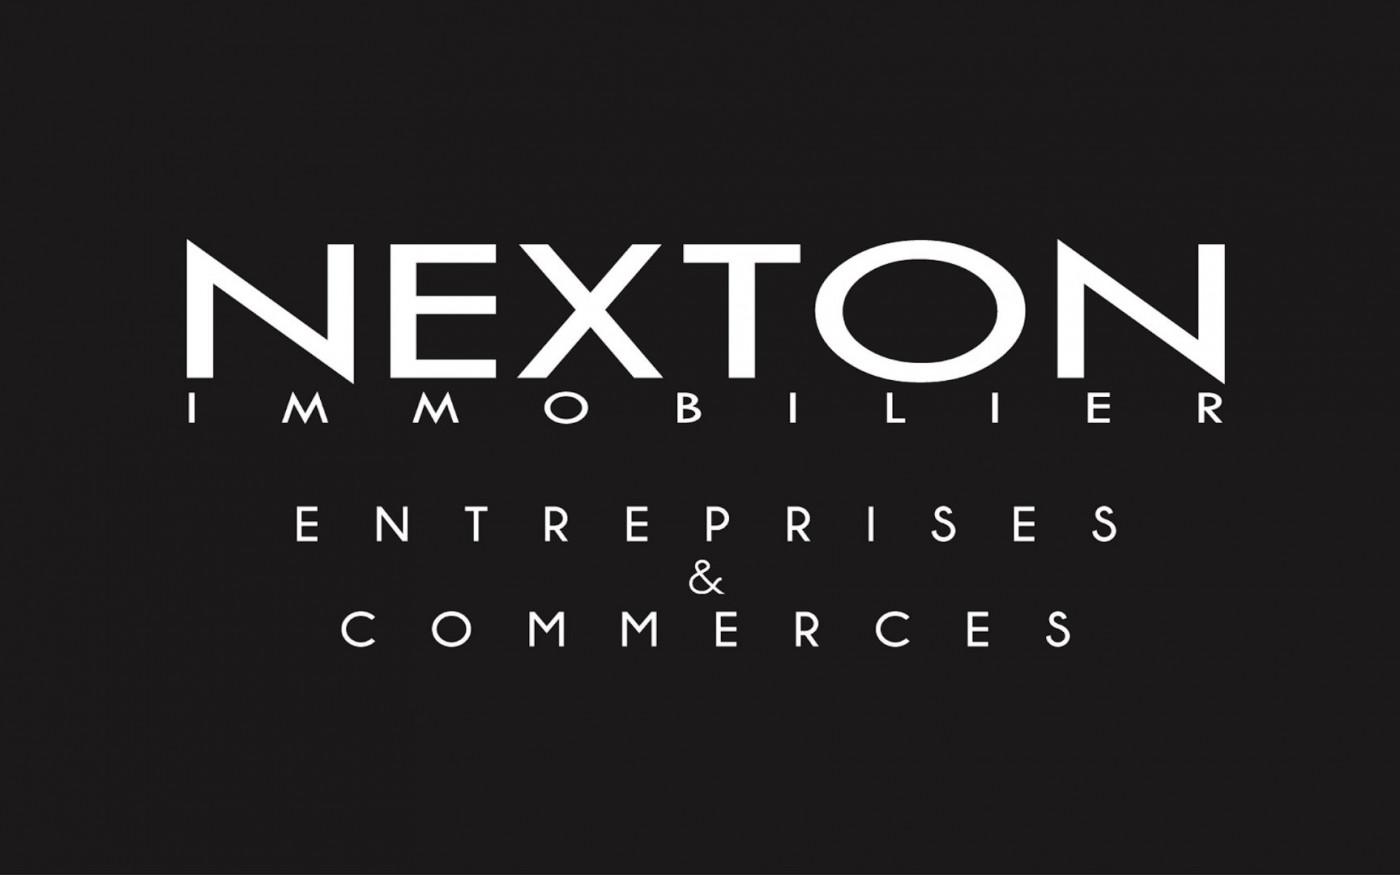 A vendre  Capbreton | Réf 40012193 - Nexton immobilier